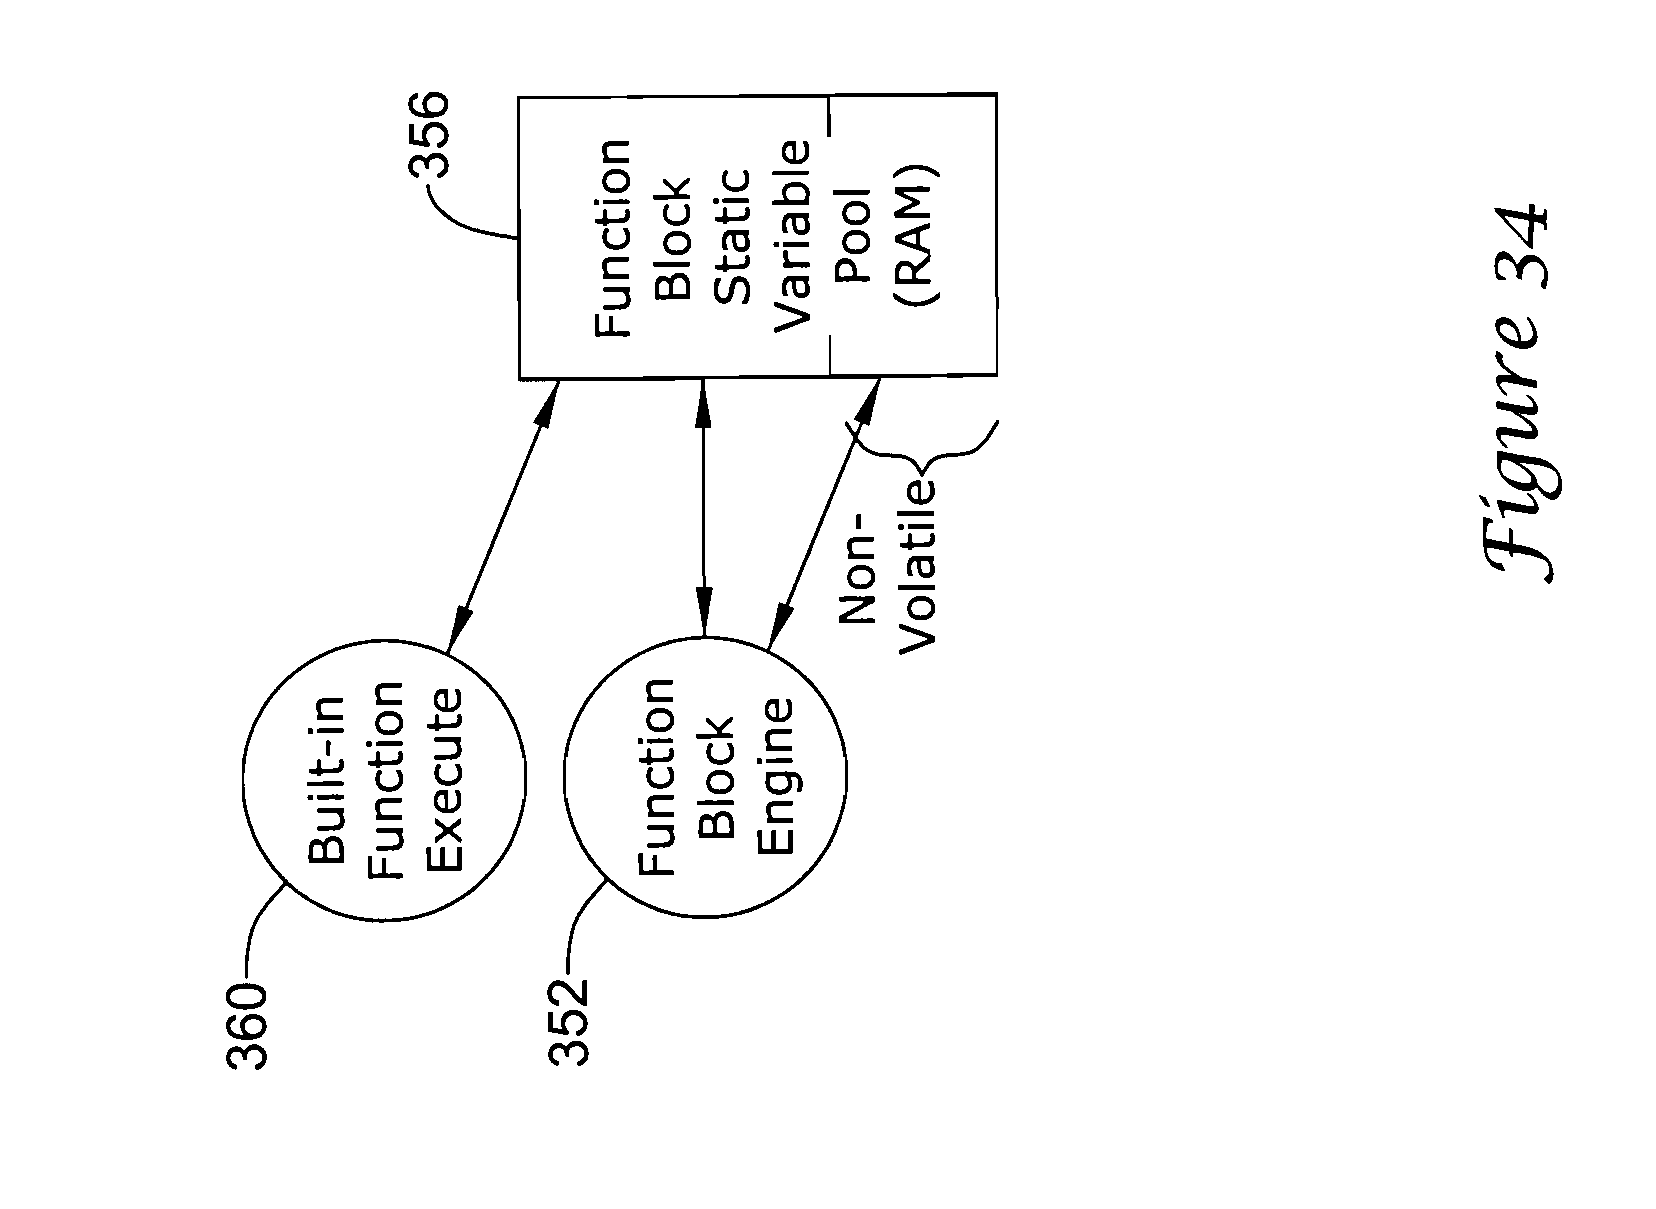 Hvac Drawing Program Auto Electrical Wiring Diagram Freeware Patent Us8112162